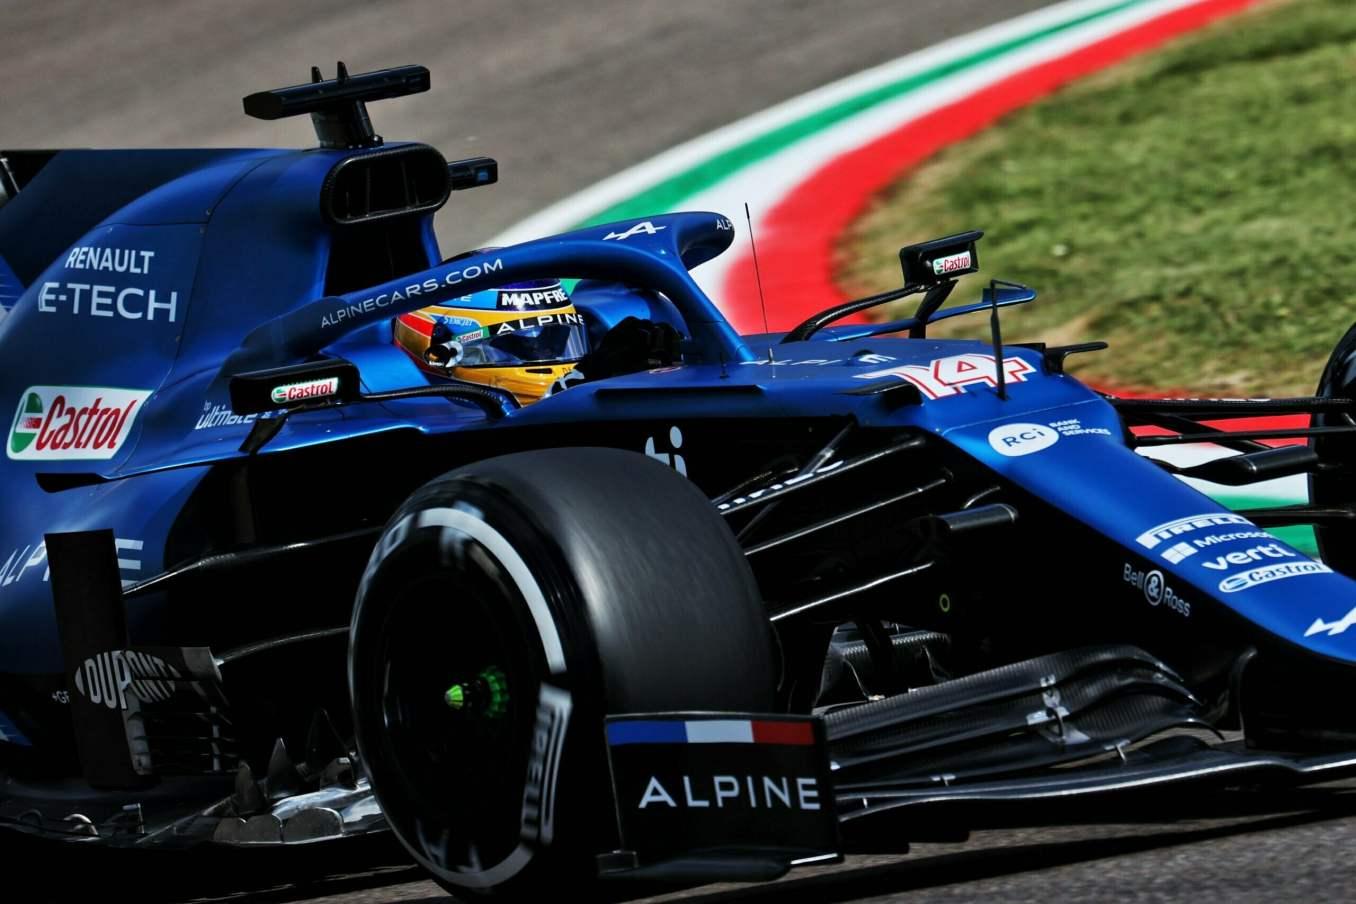 Alpine F1 Team A521 Alonso Ocon Brivio Permane Imola 2021 Test 10 scaled | Alpine F1 Team en milieu de peloton aux essais à Imola